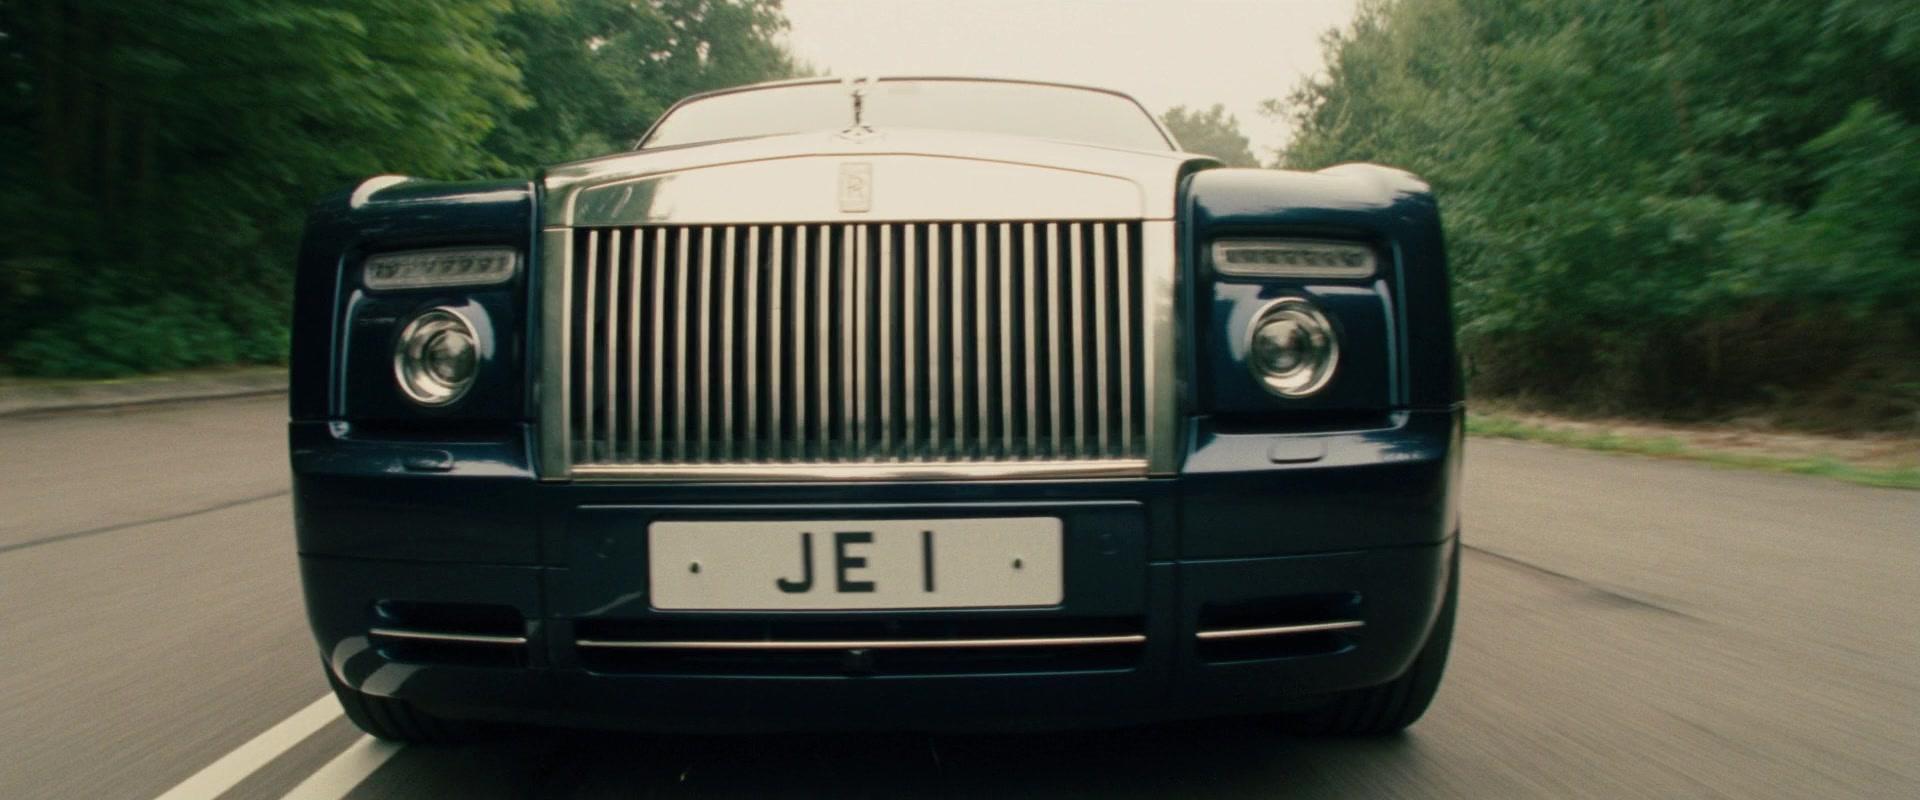 Rolls-Royce Phantom Coupé Luxury Convertible Car in Johnny English Reborn (2011) Movie